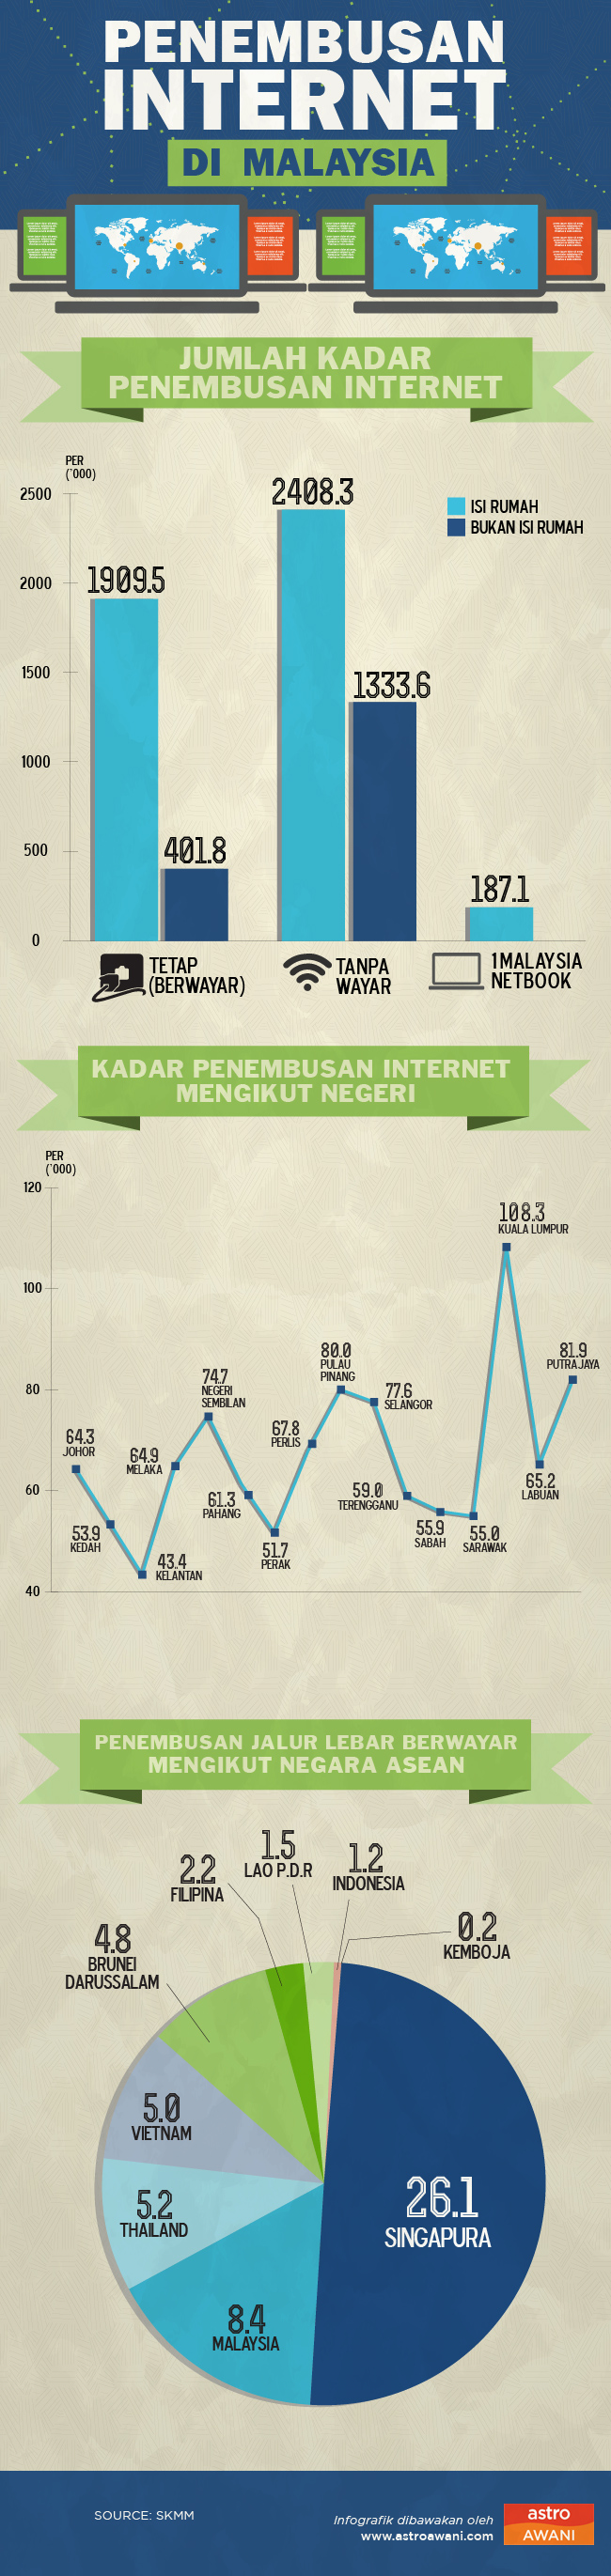 Penembusan internet di Malaysia